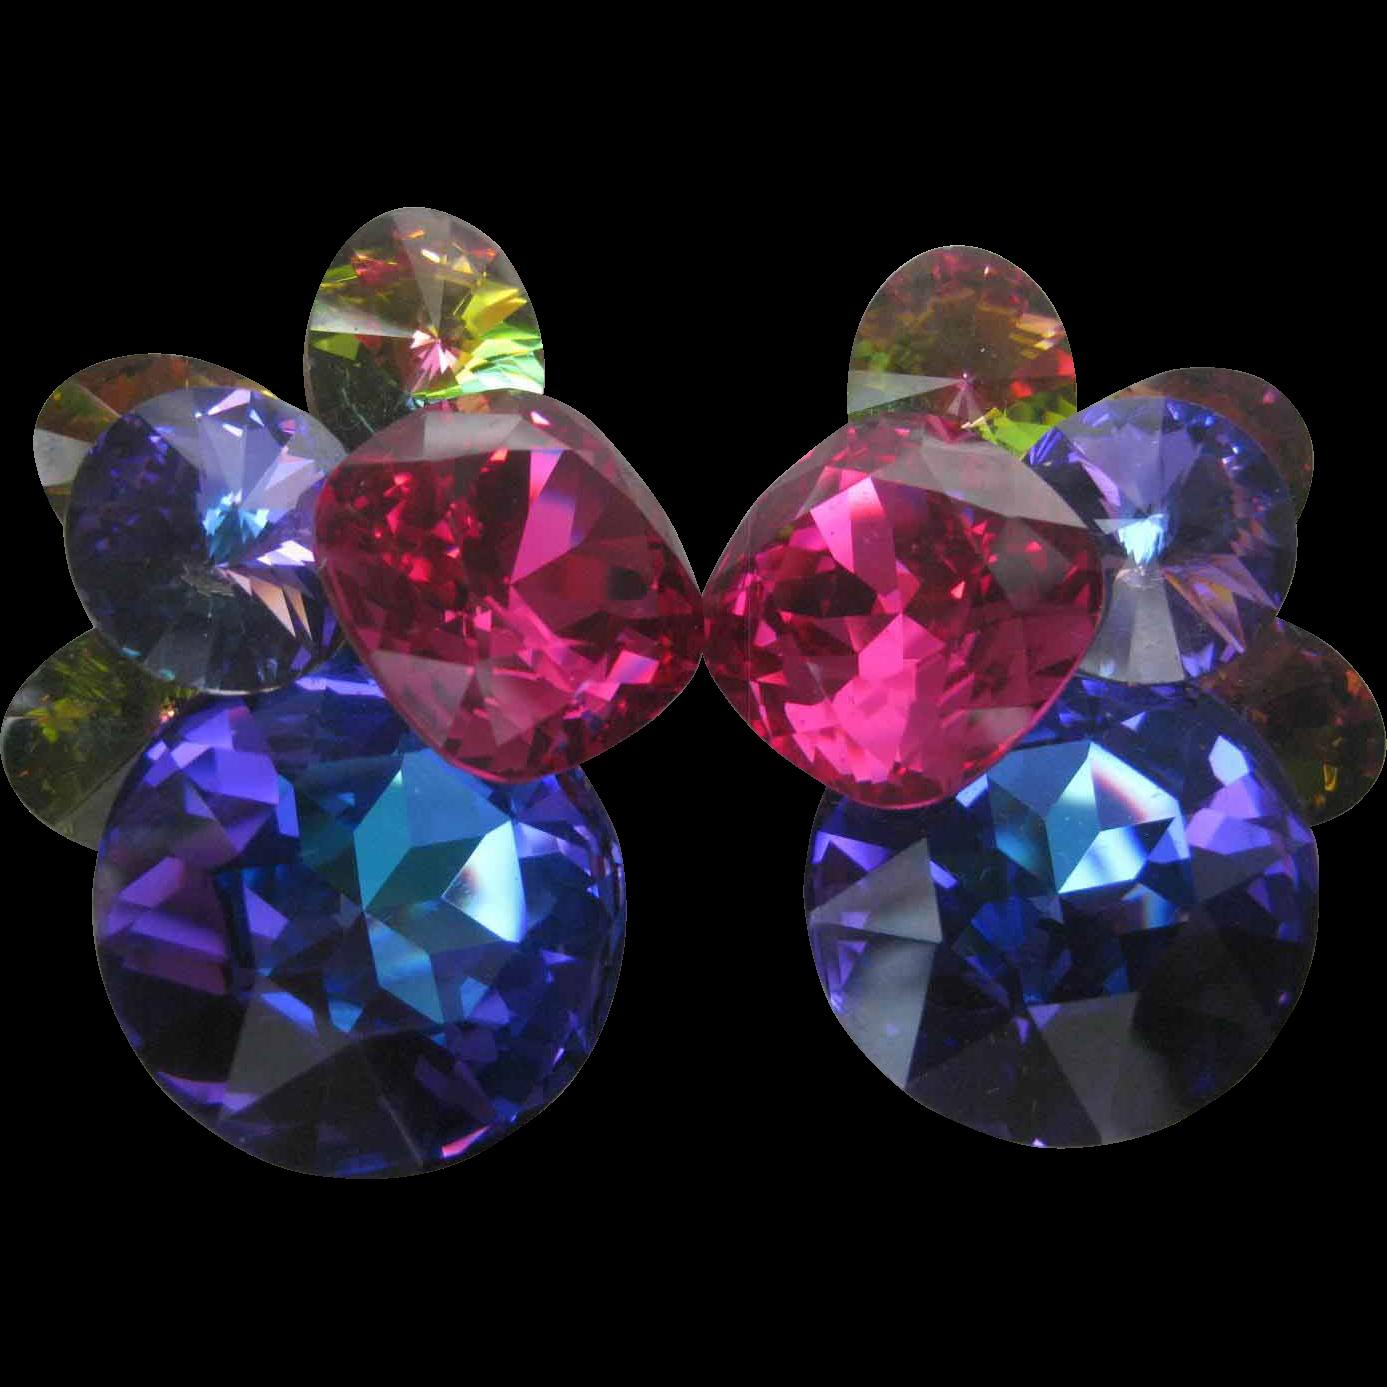 Stunning Vintage Glass Stones Cluster Earrings